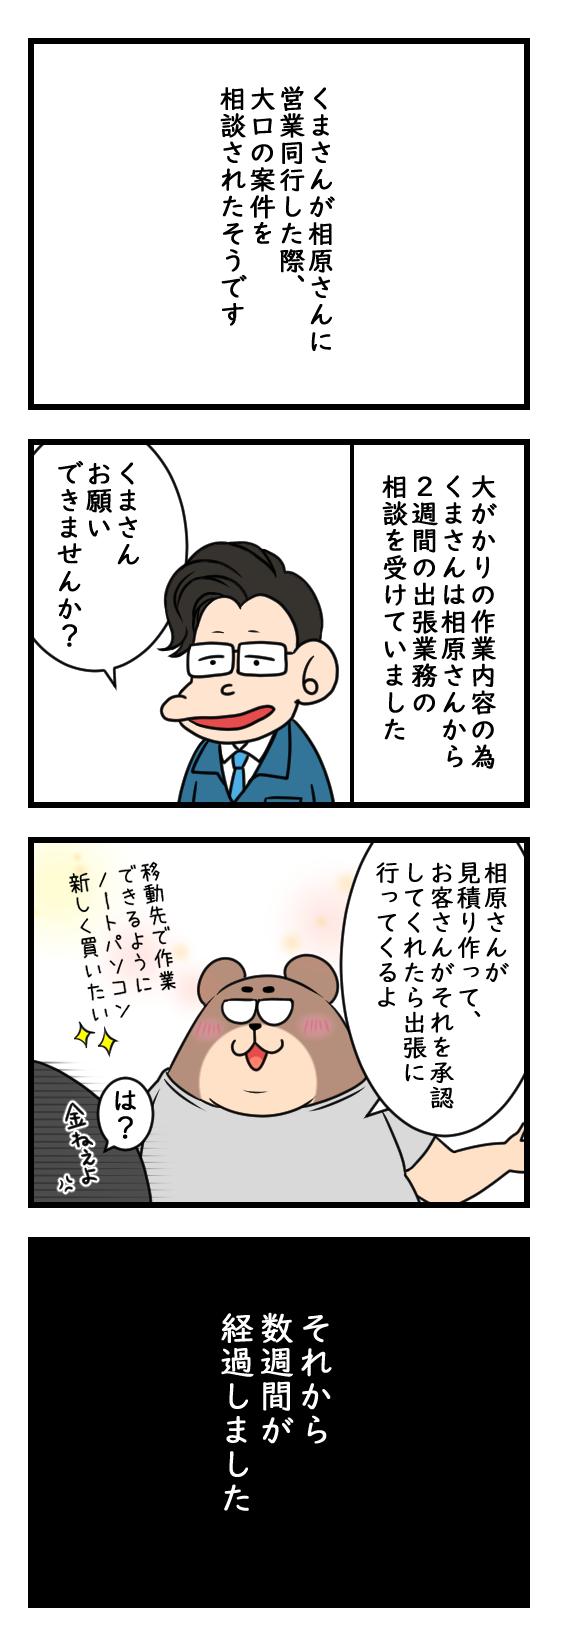 003_1